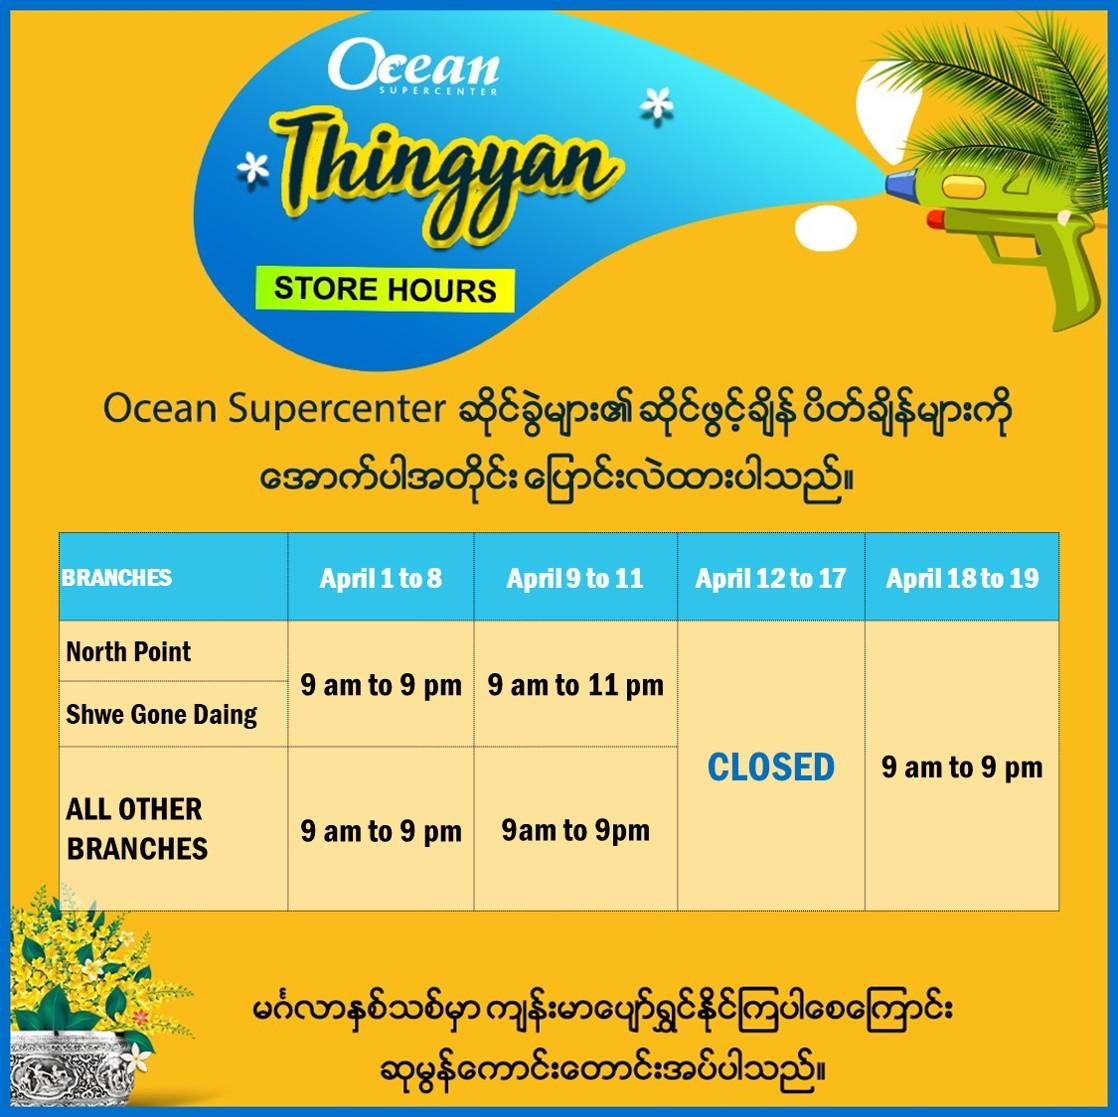 Oceanの営業時間を書いてある表